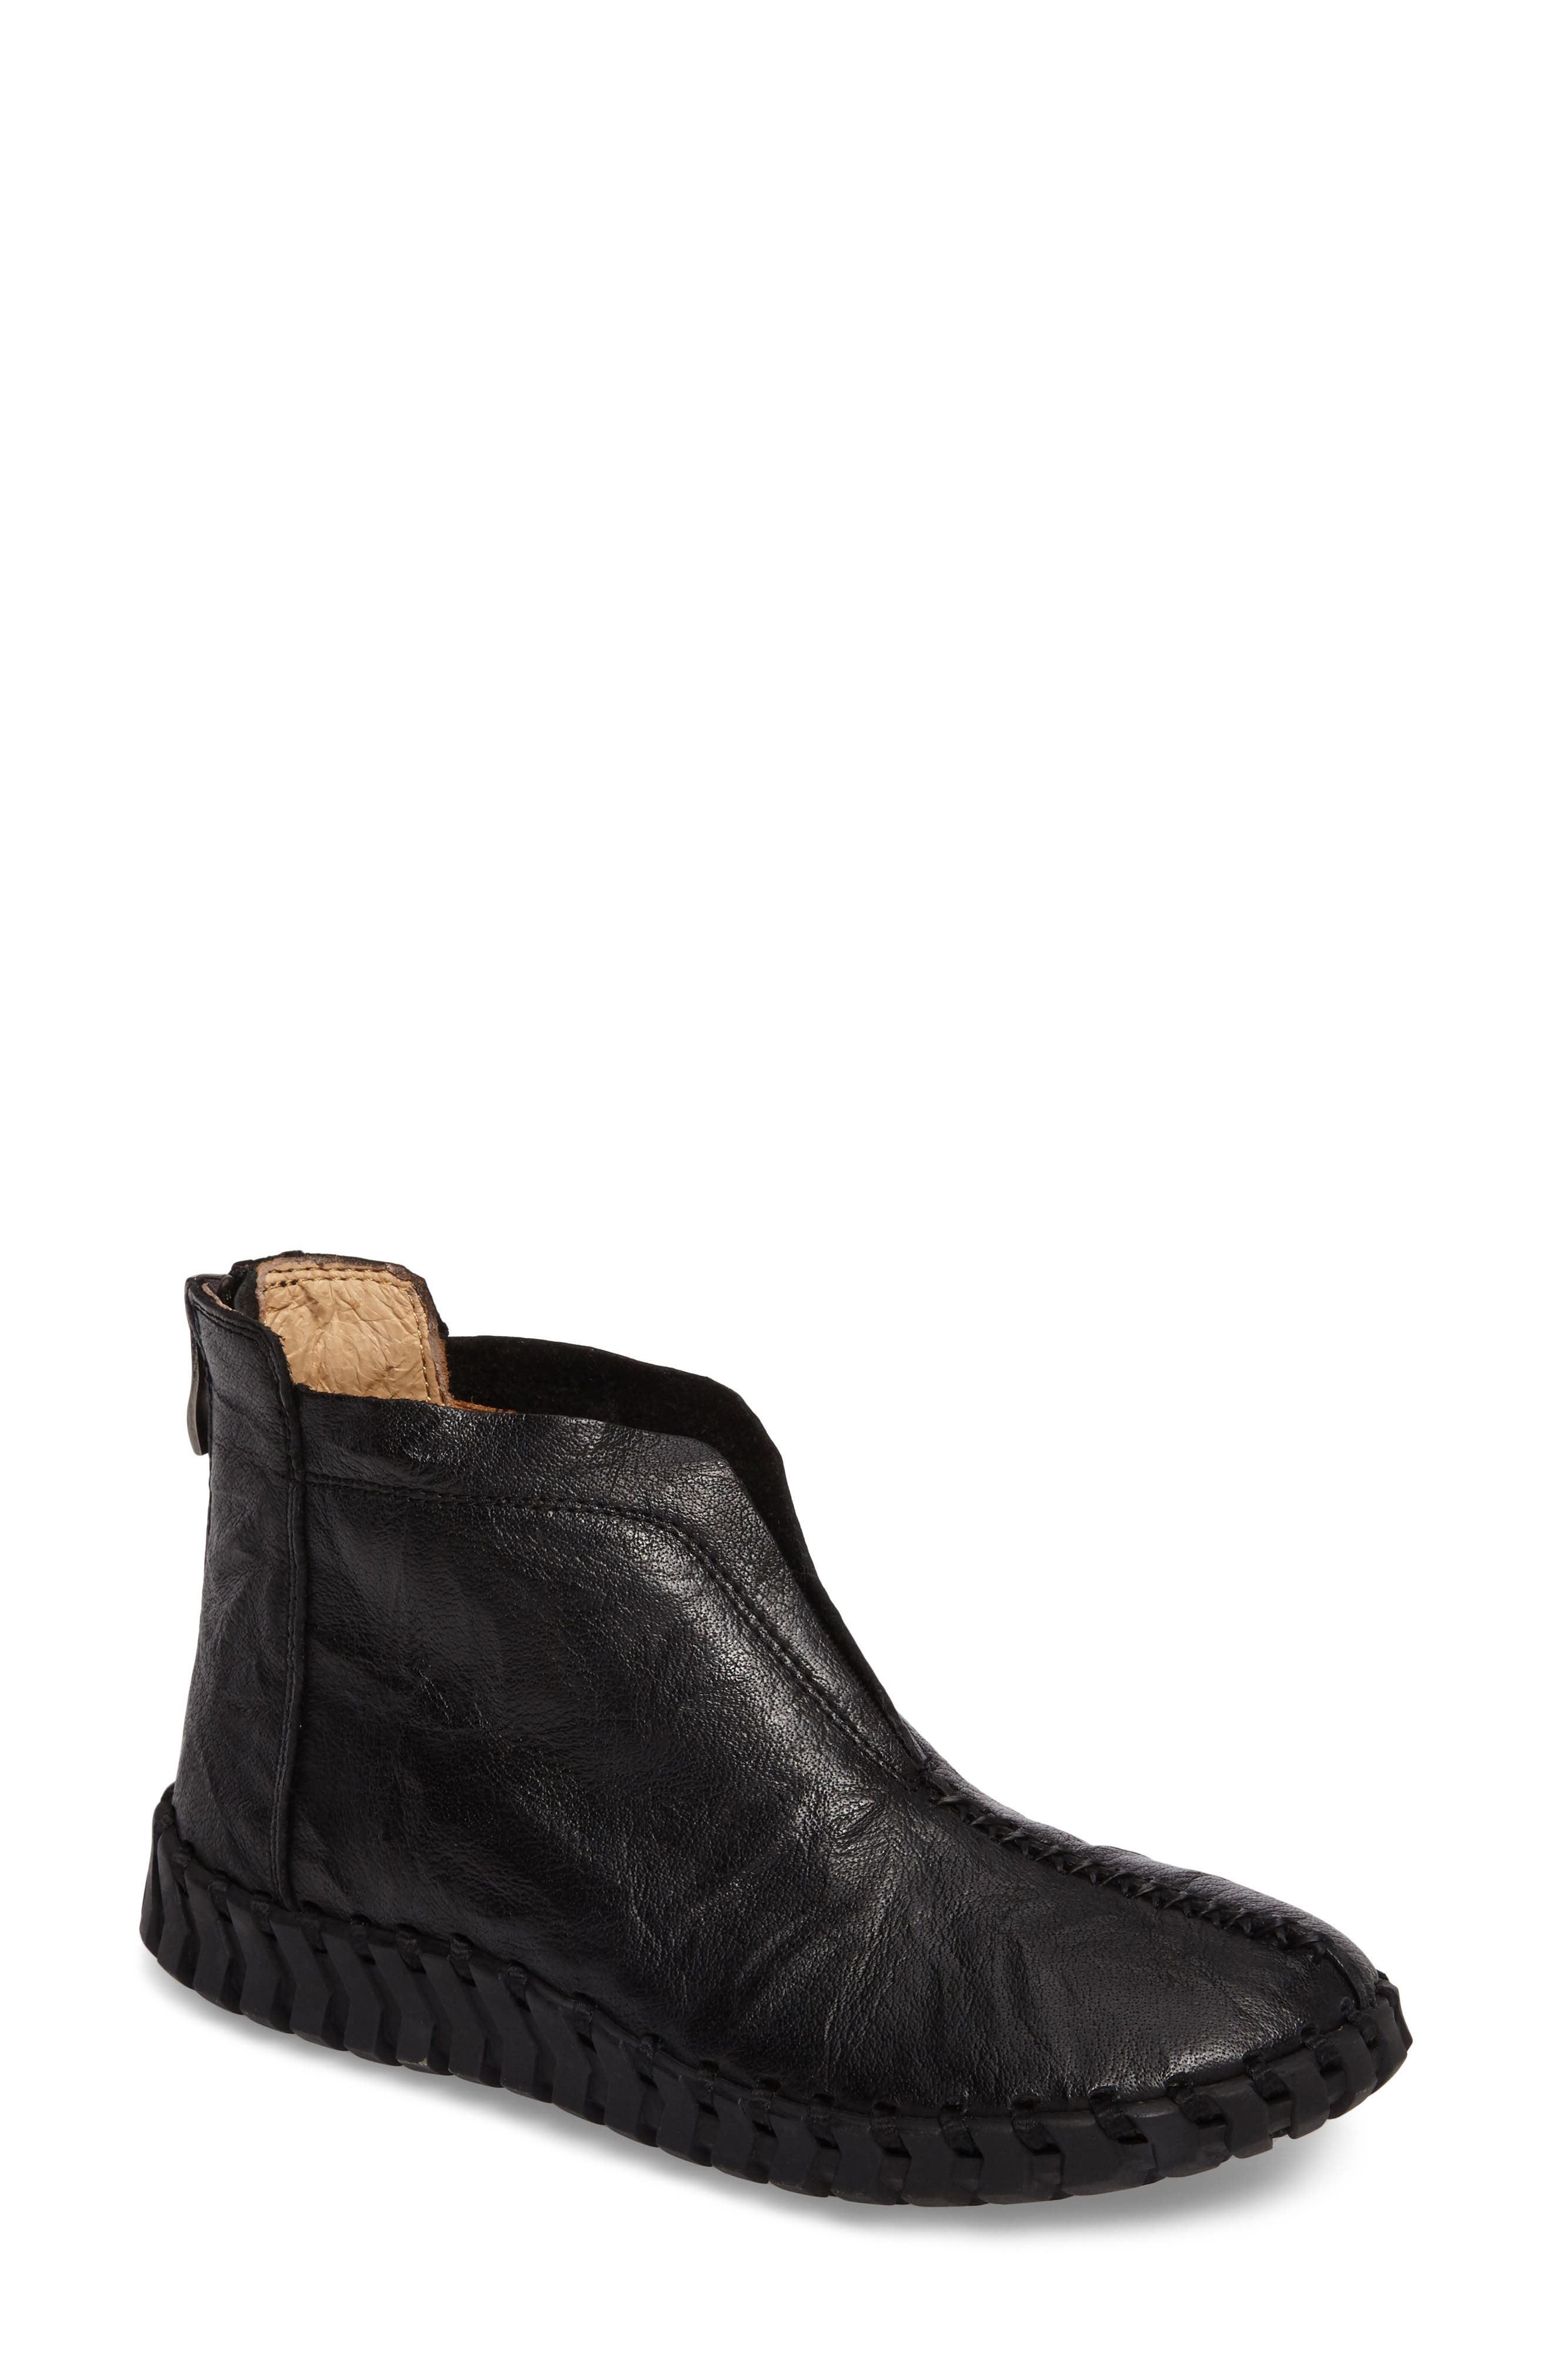 TW79 Bootie,                             Main thumbnail 1, color,                             Black Leather